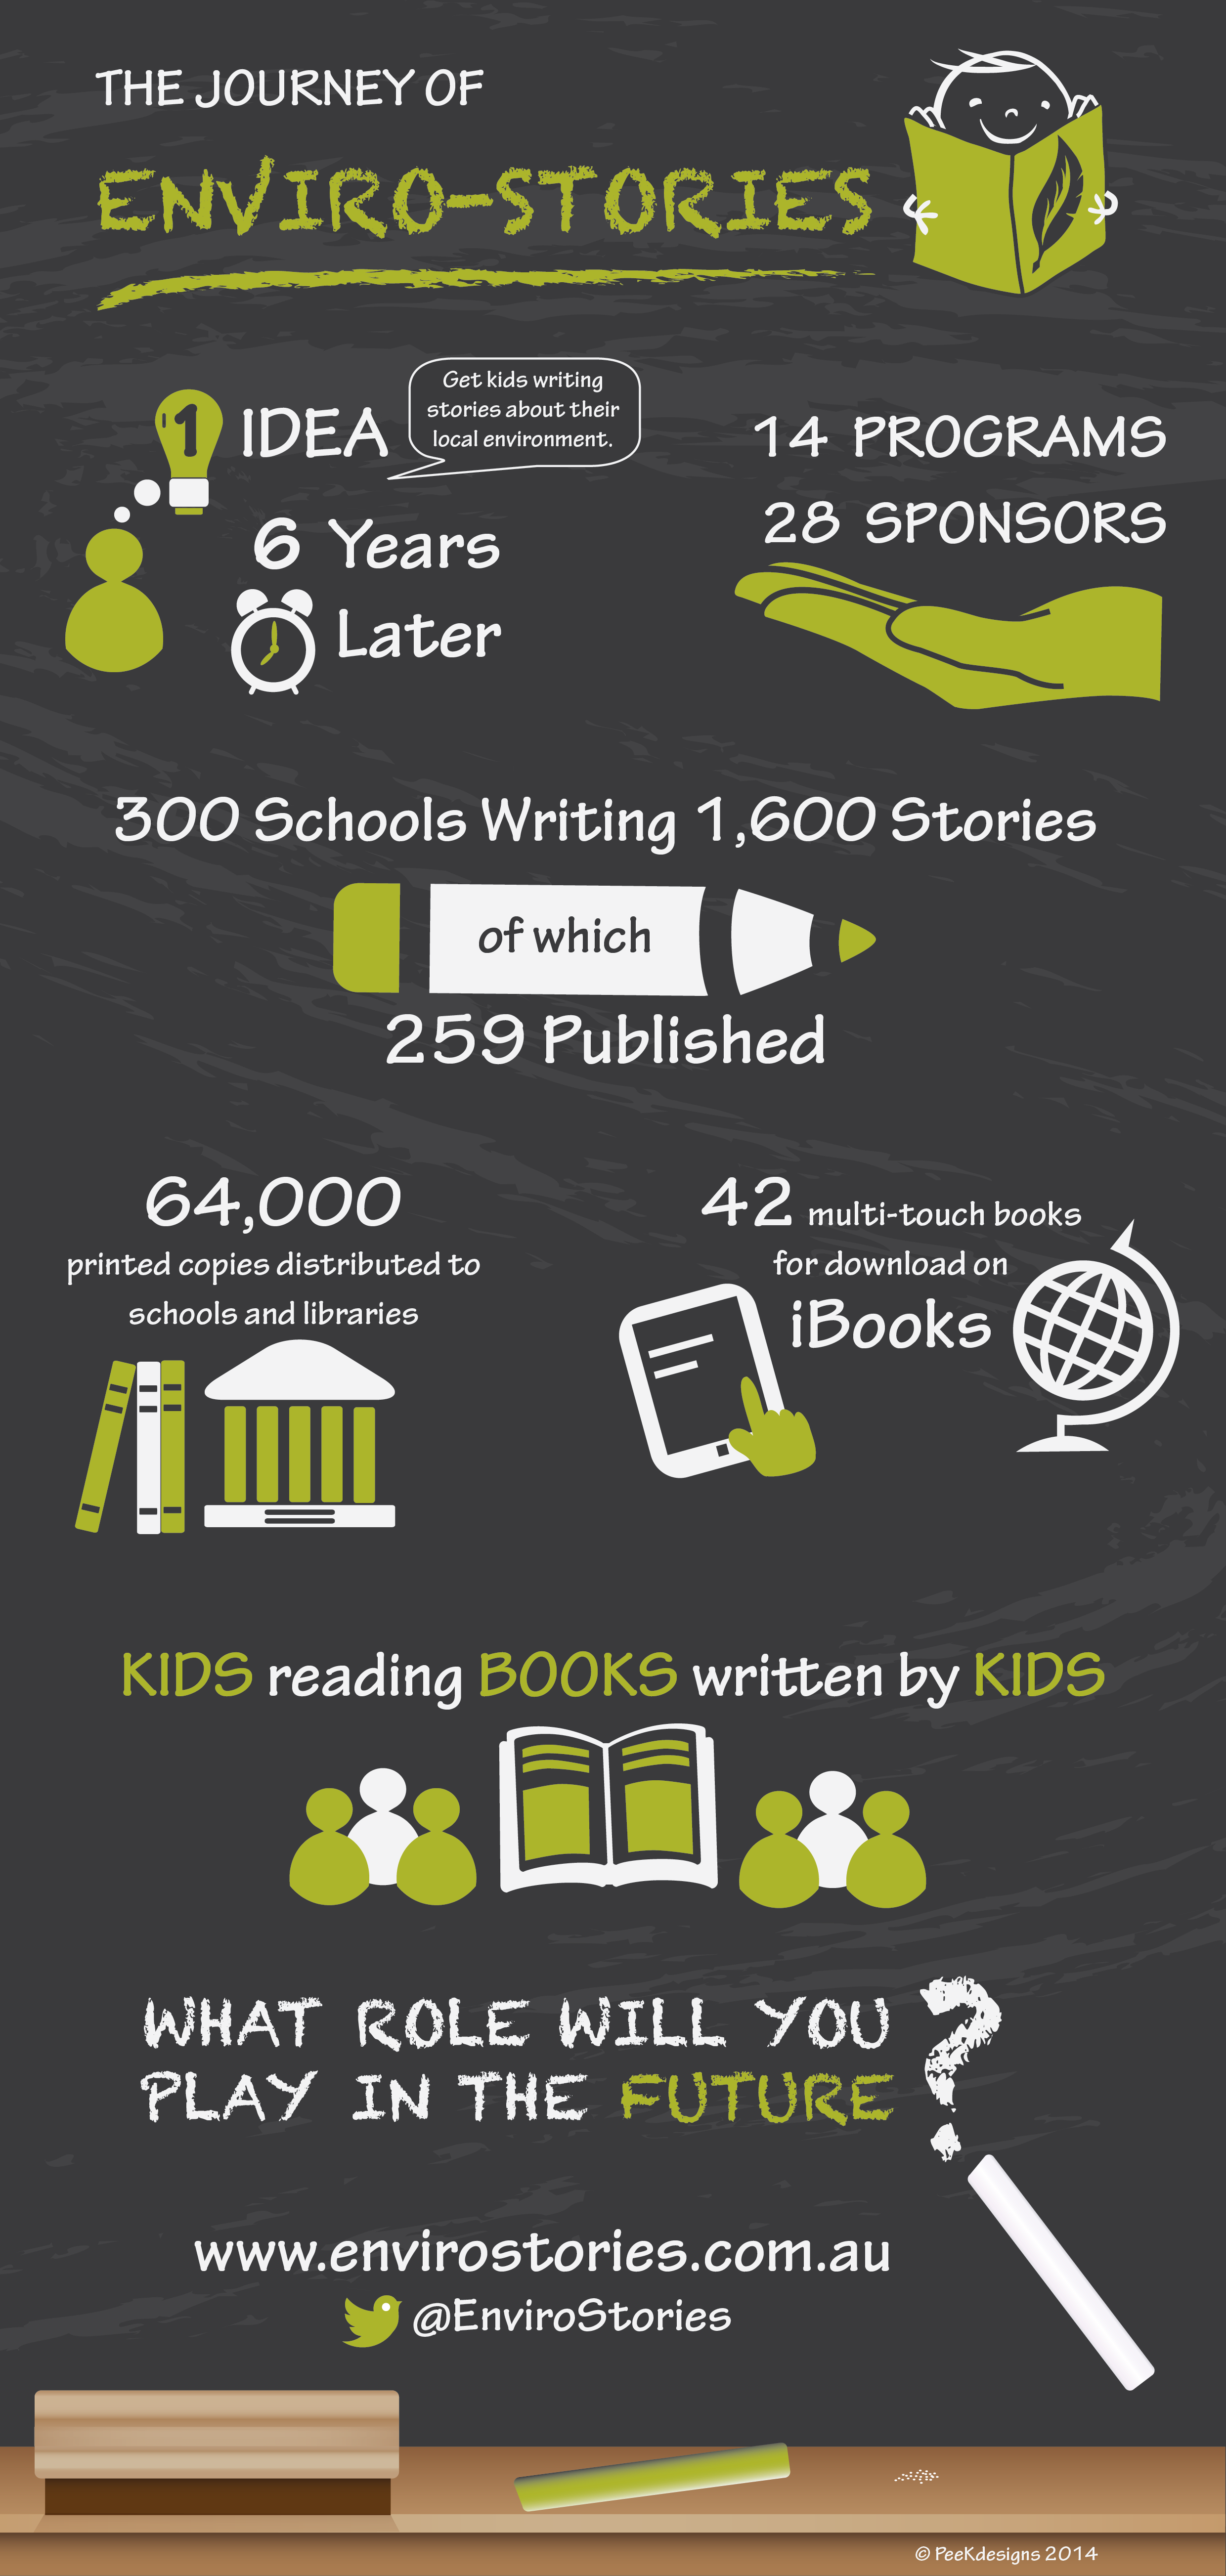 Enviro-stories Journey Infographic